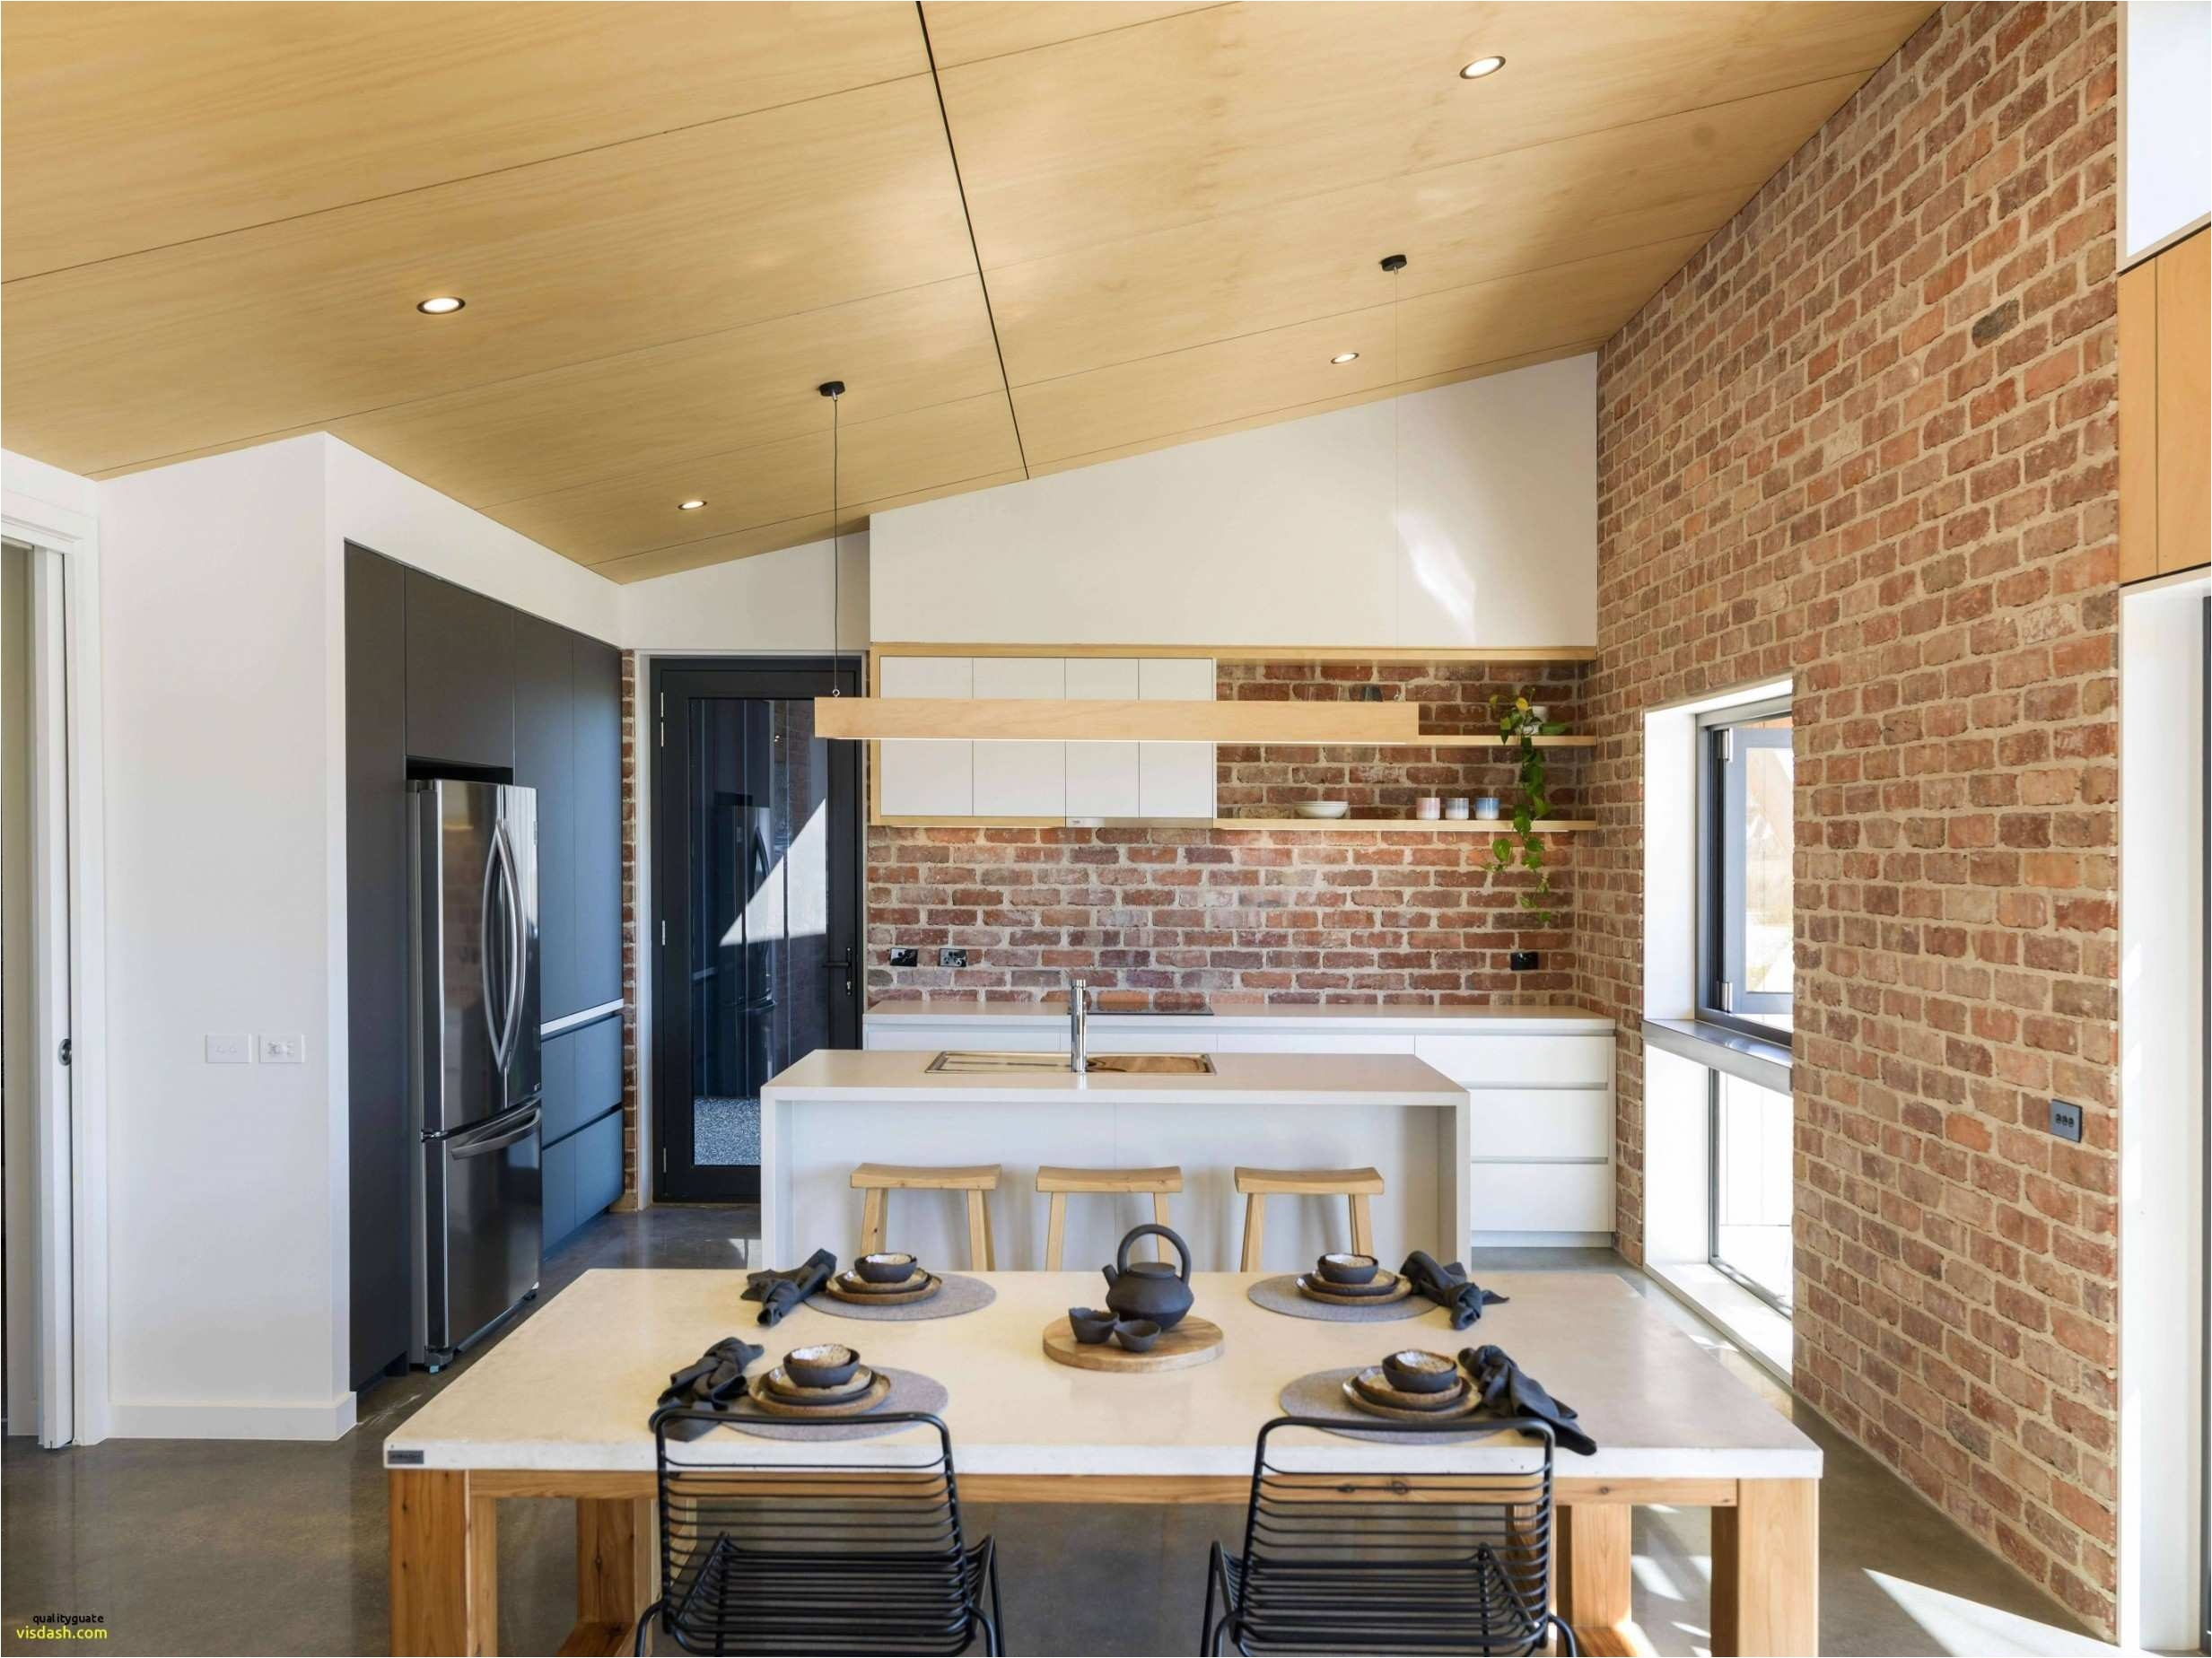 Modern Girls Bedroom Lovely Basement Furniture Ideas Kitchen Decor Ideas Best Items New Zeev 0d